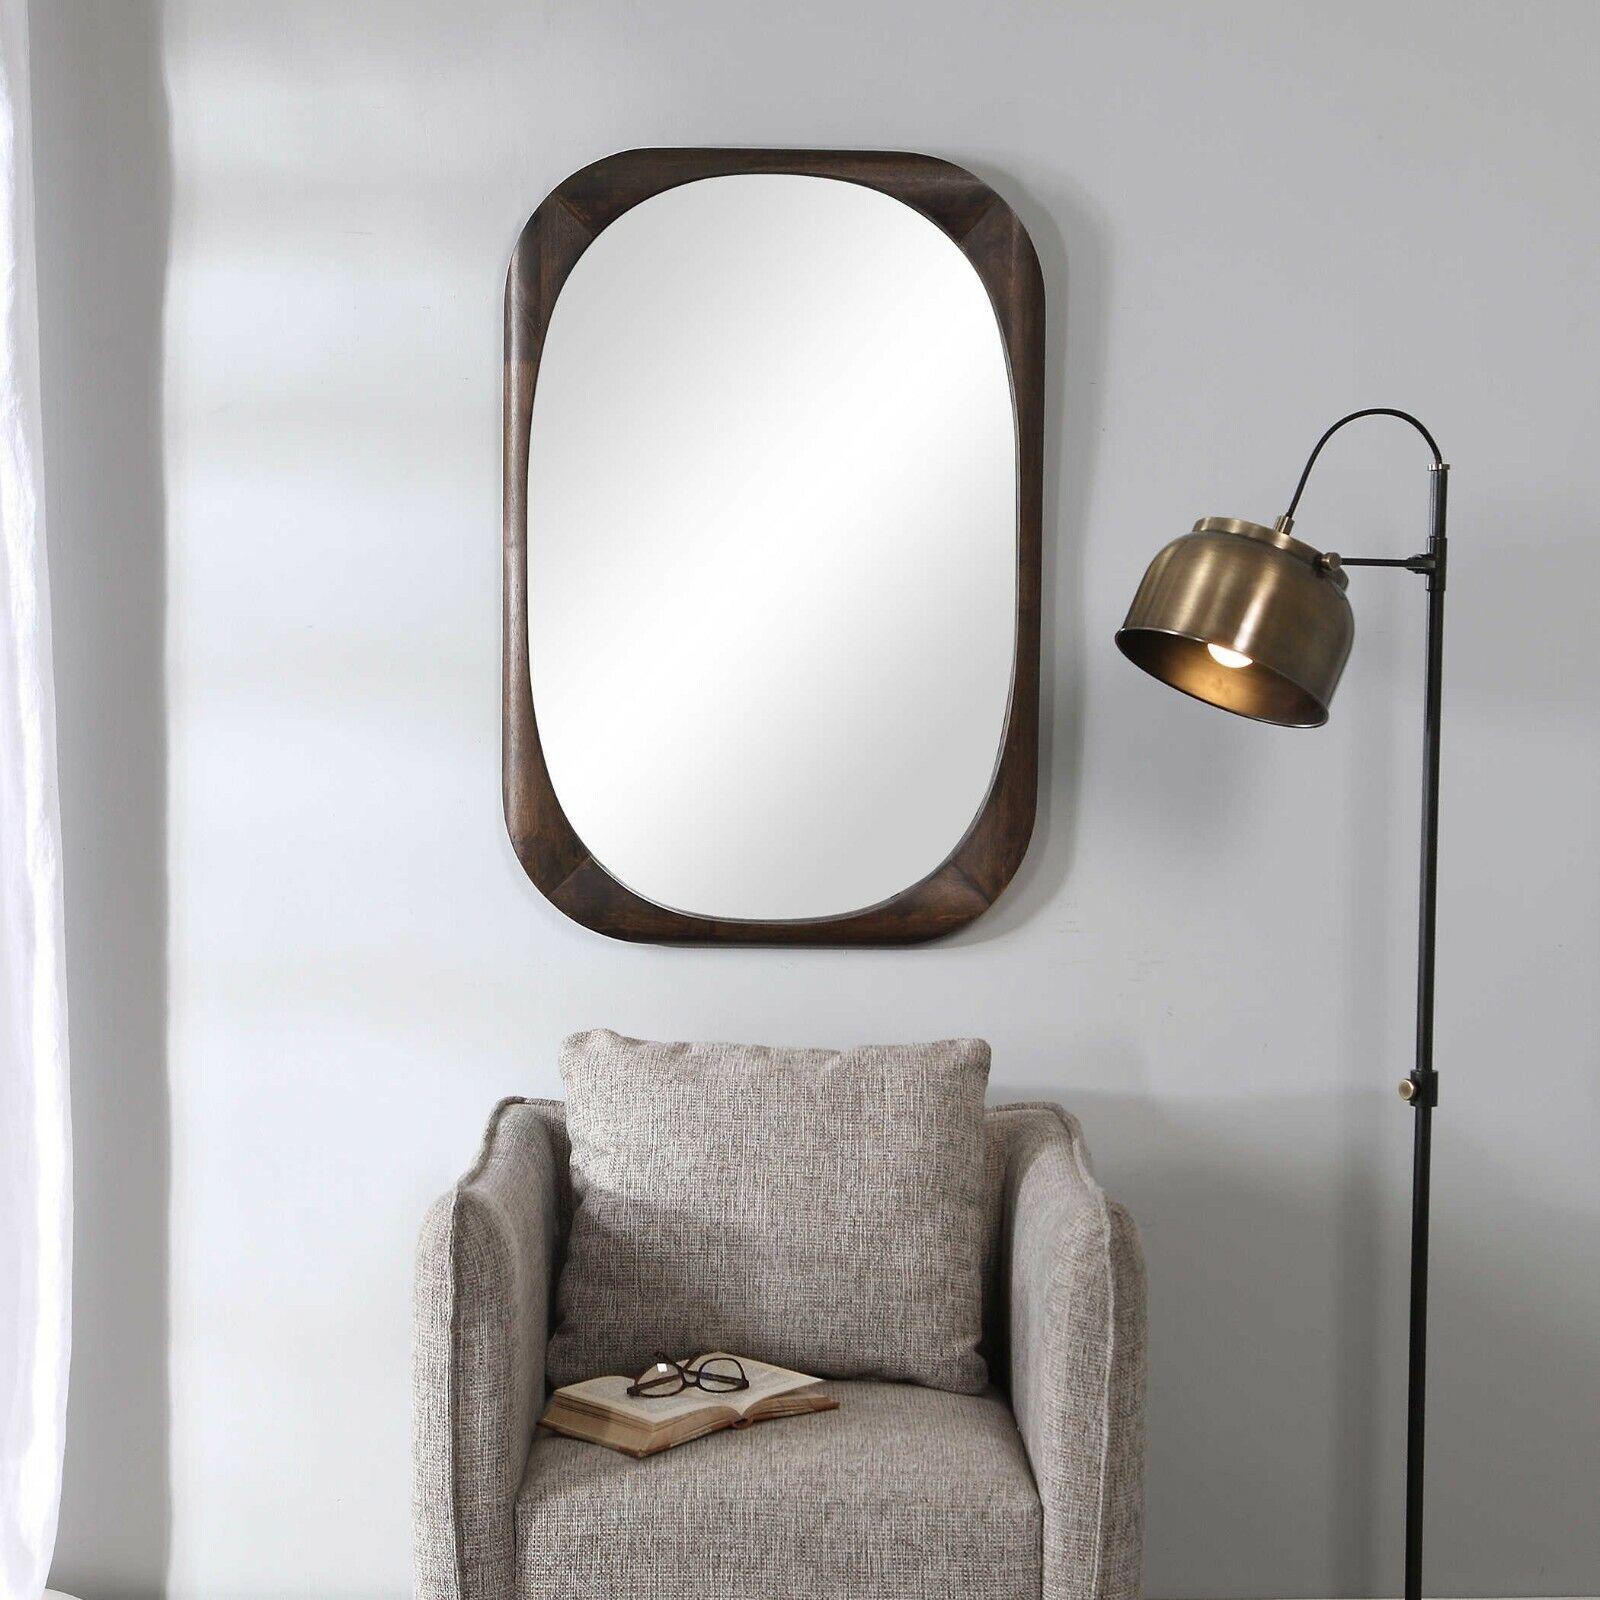 Sheldon Mission Mid Century Modern Wood Xxl 38 Wall Vanity Mirror Uttermost